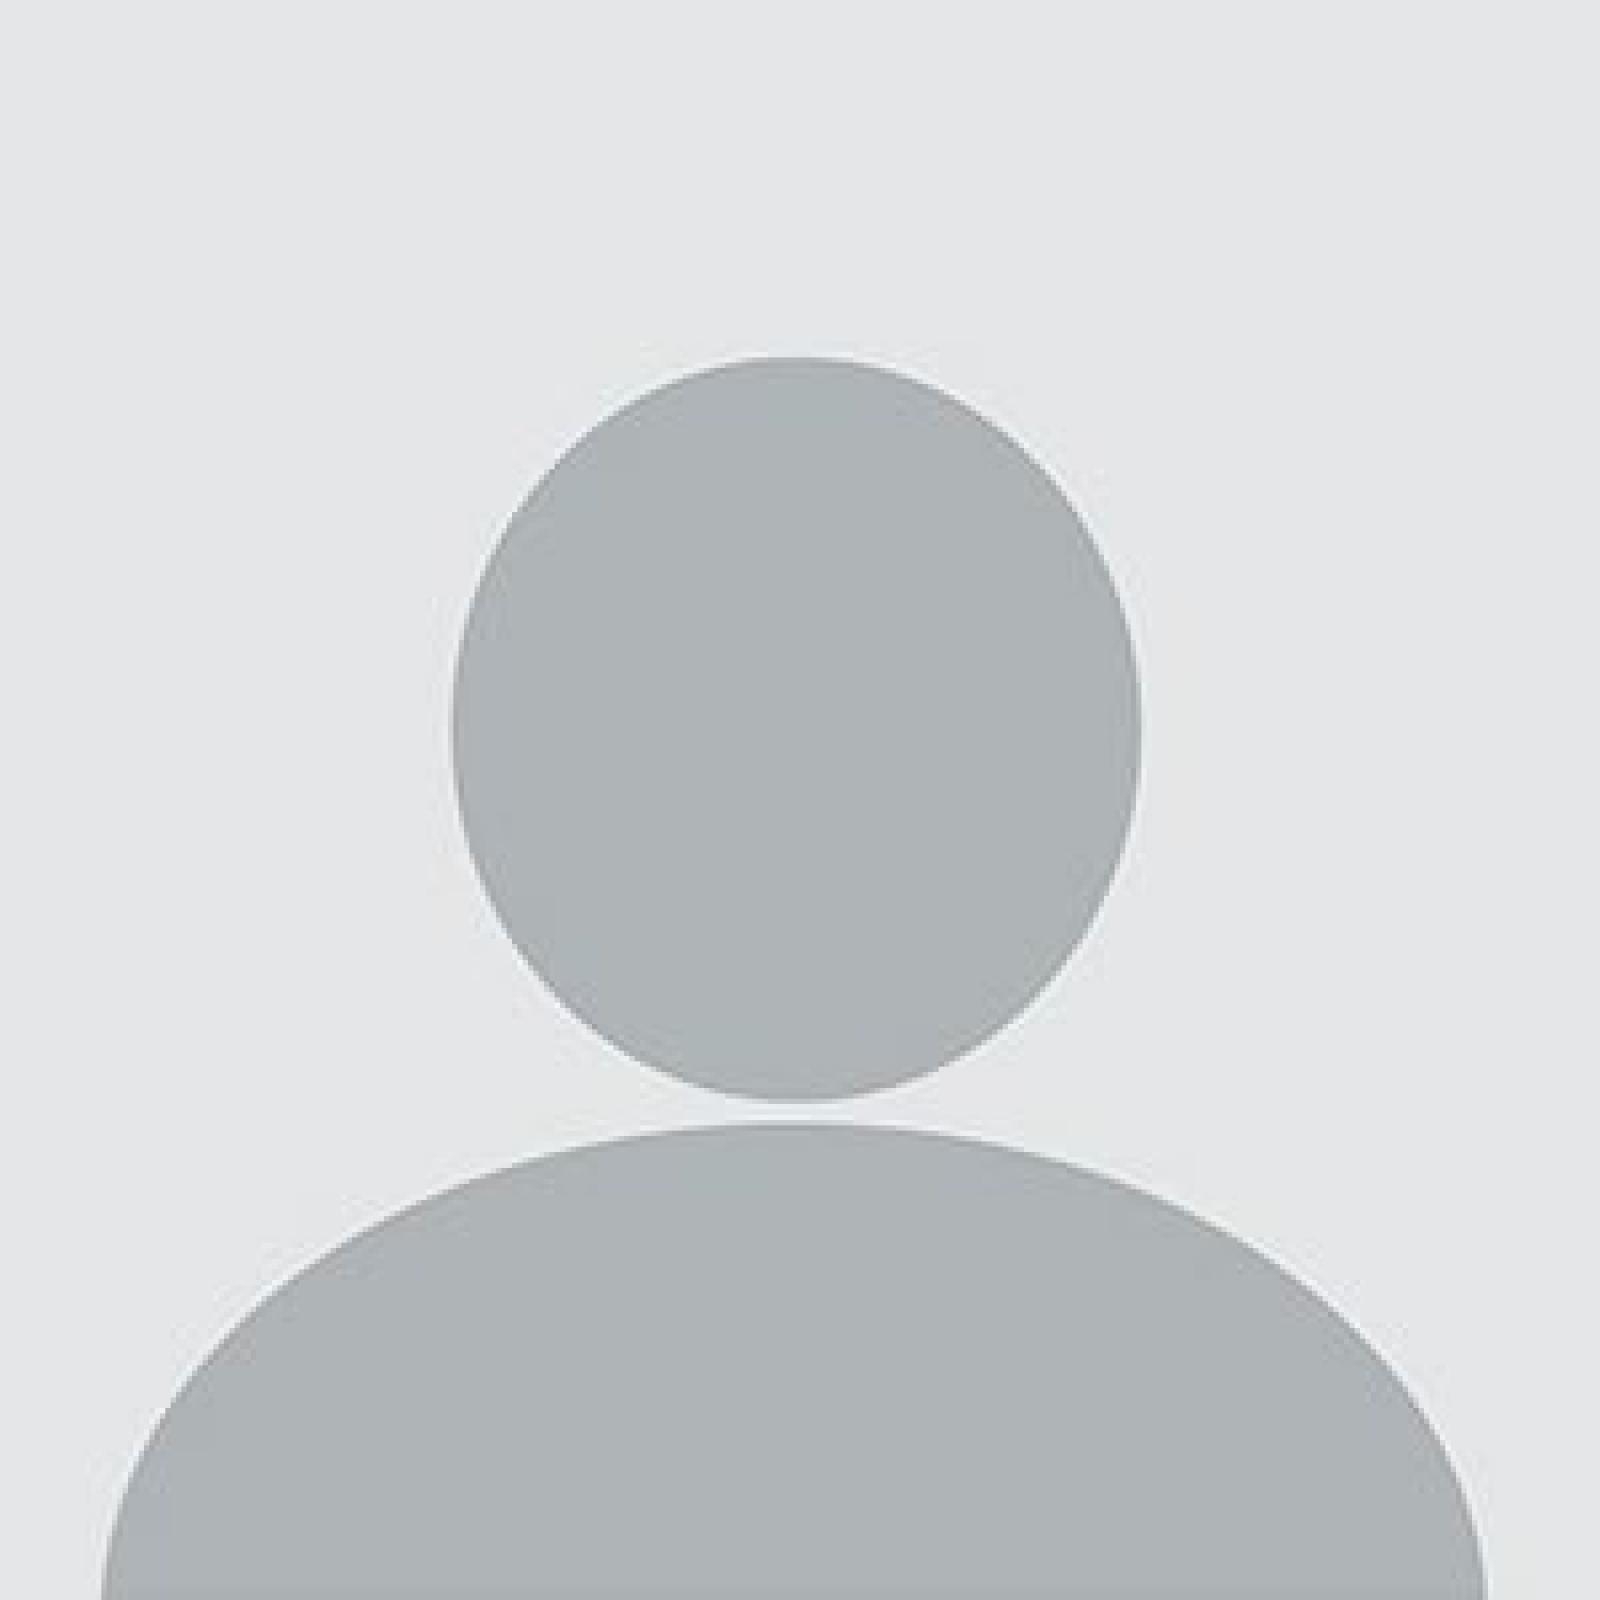 Mahek Shroff - Leisurekart Review